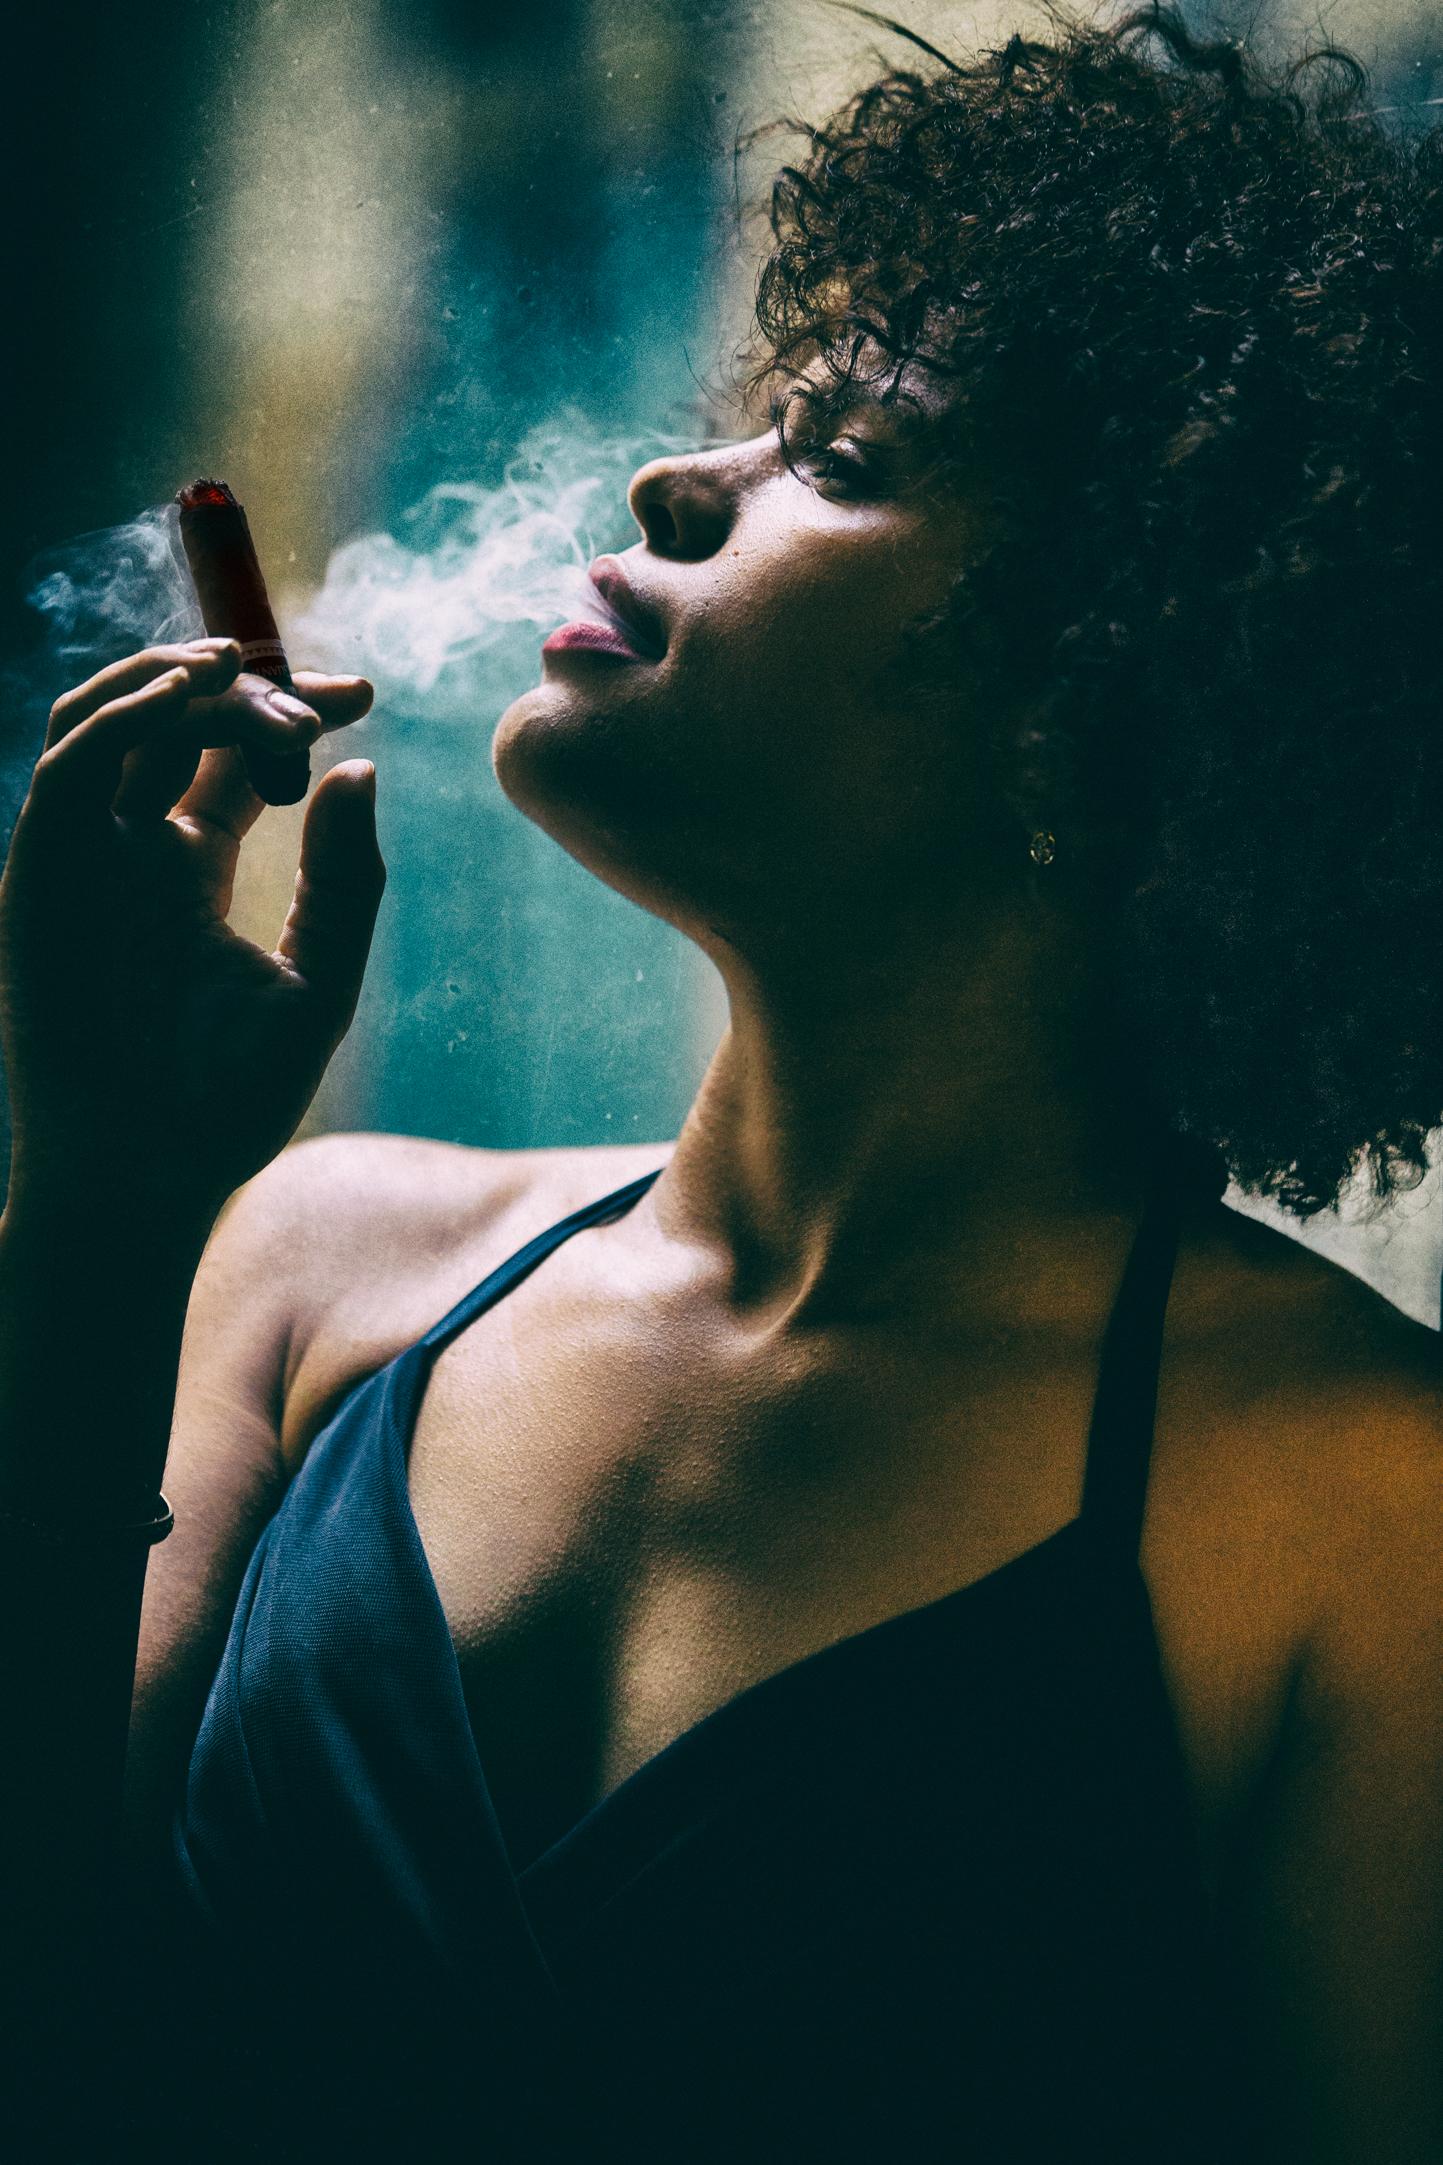 _47B9544_NIK_COLOR_DARK_WetPlate_Doria-Cigar.jpg